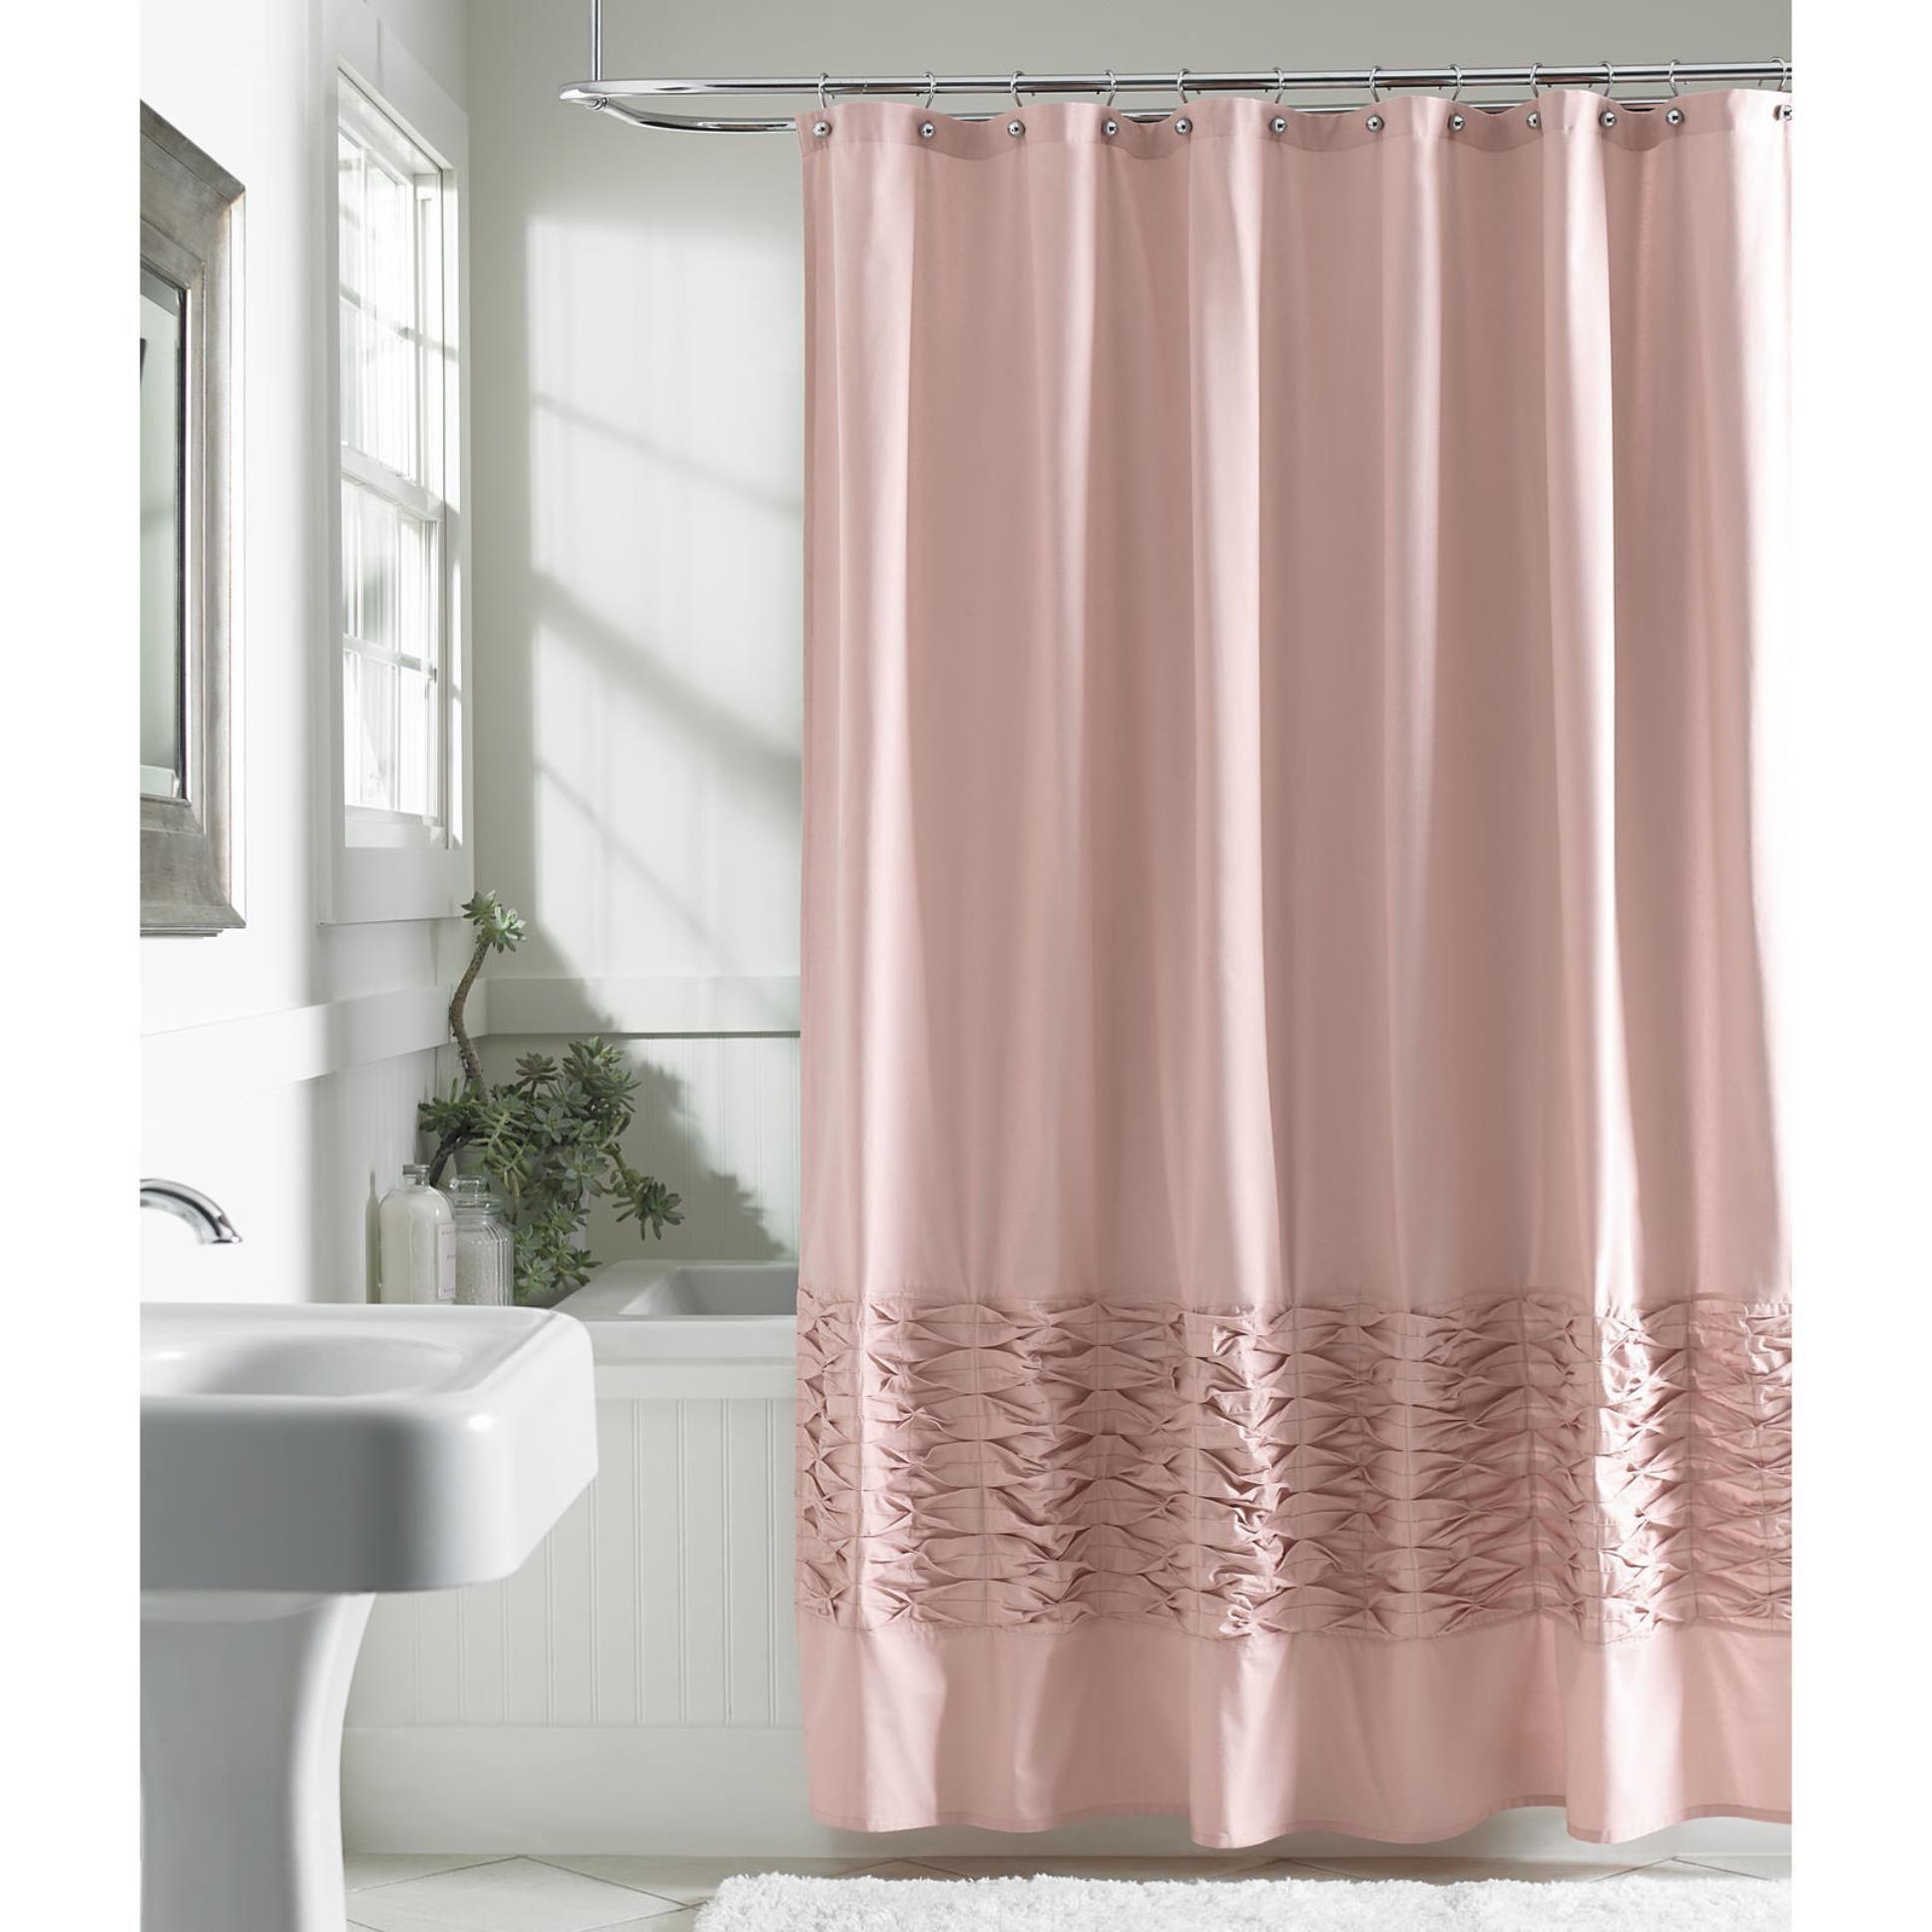 Metaphor Fabric Shower Curtain Blush Pink Pink Shower